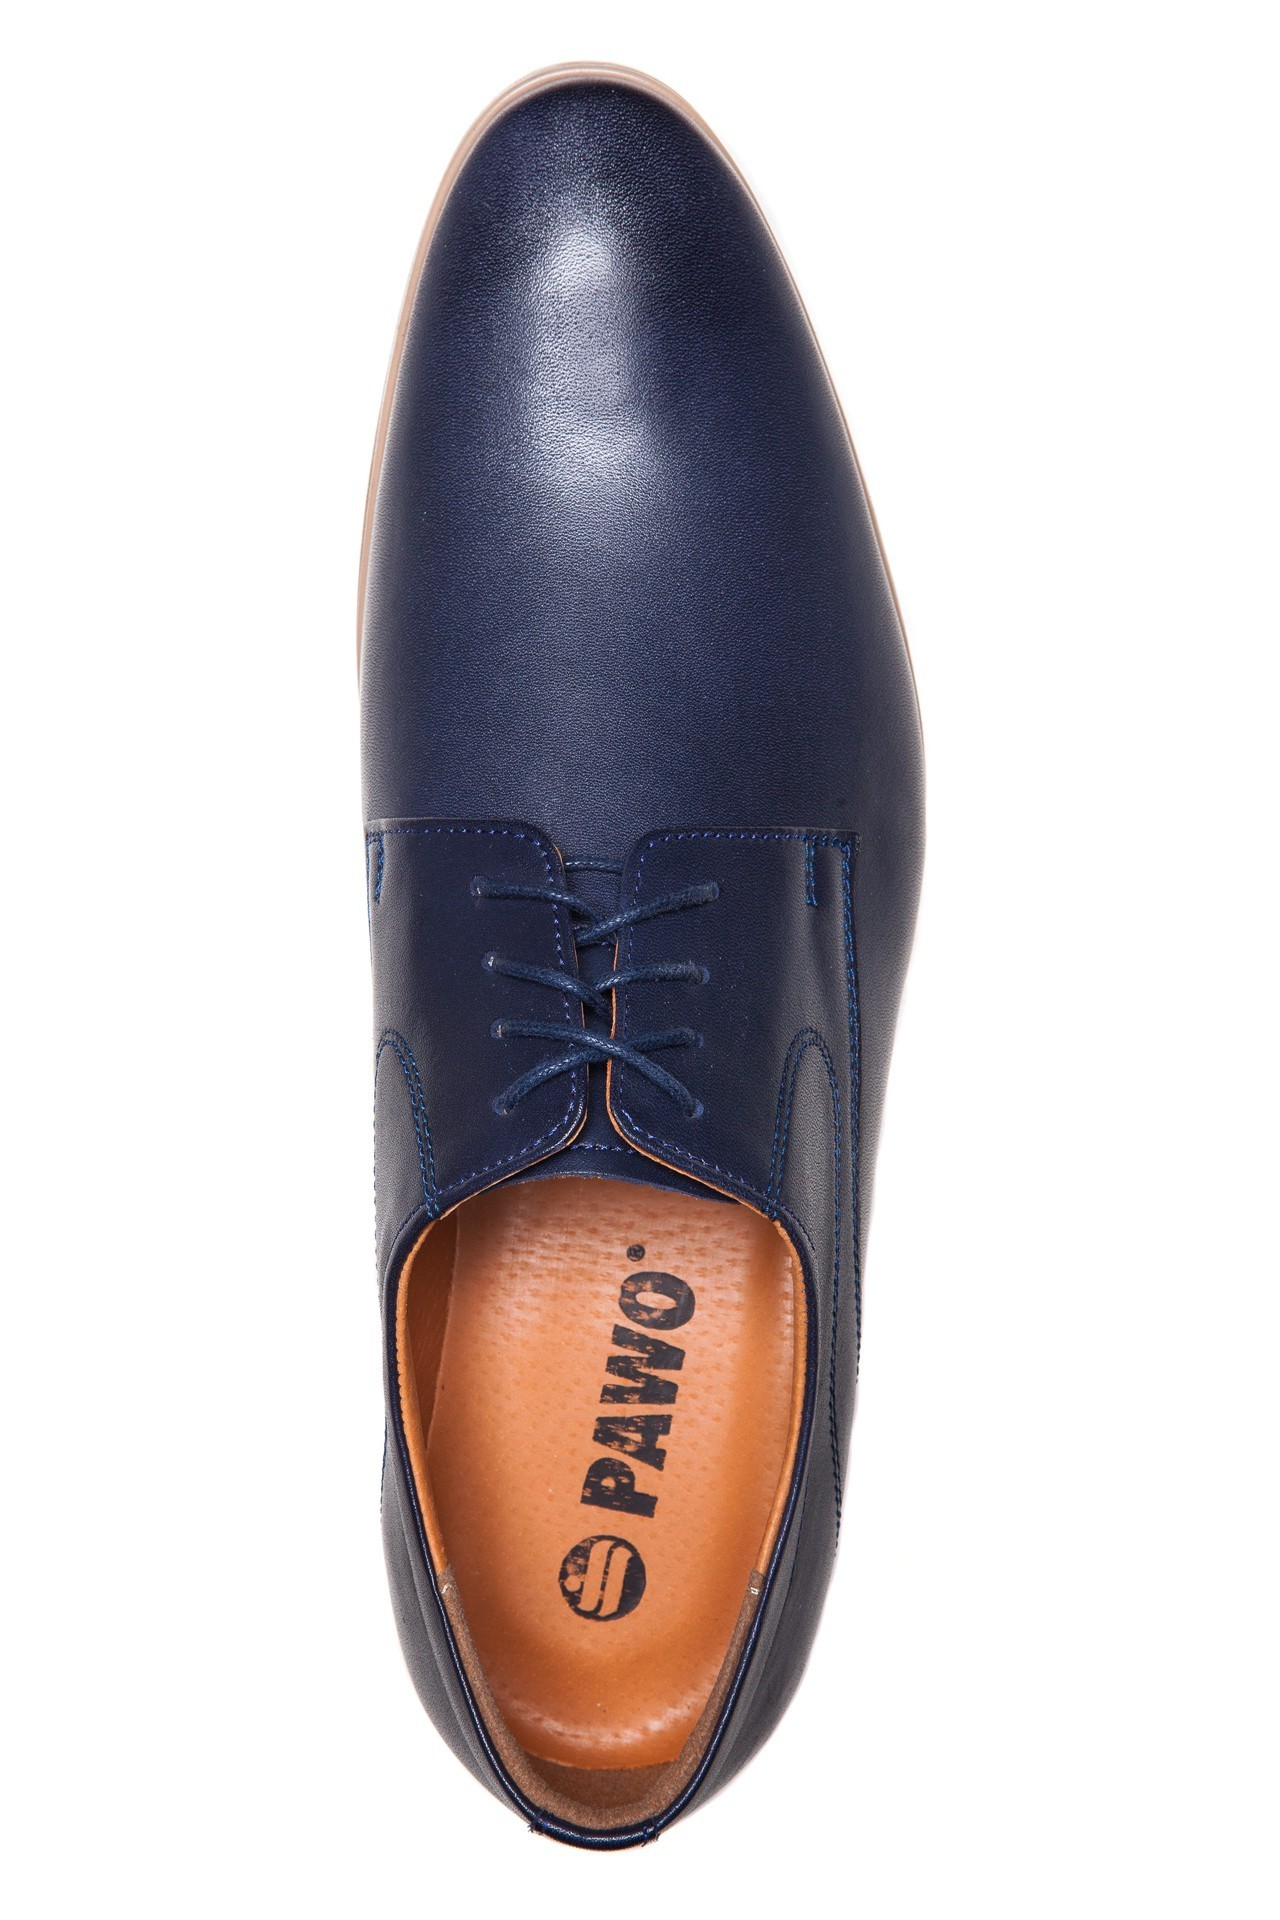 Granatowe buty męskie do garnituru